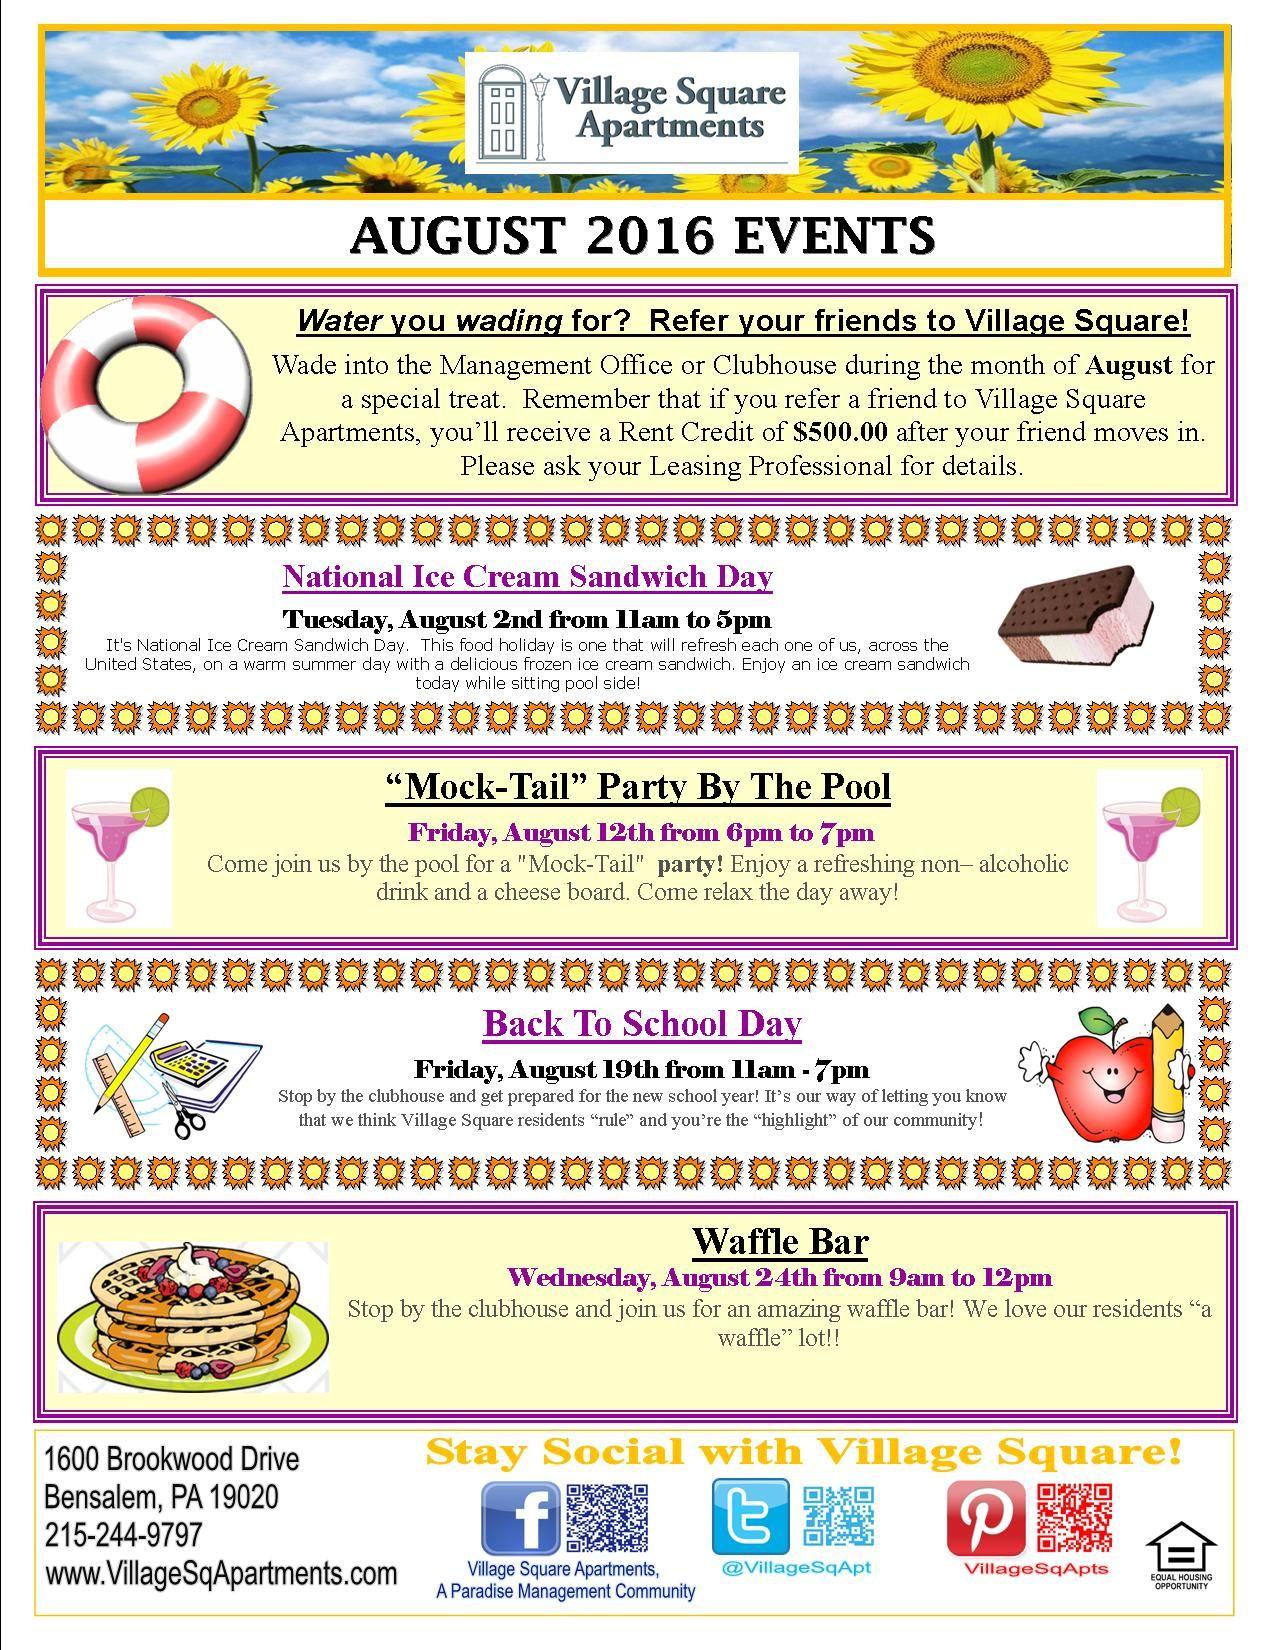 Marketing Office Arketing Ideas August Events Resident Retention